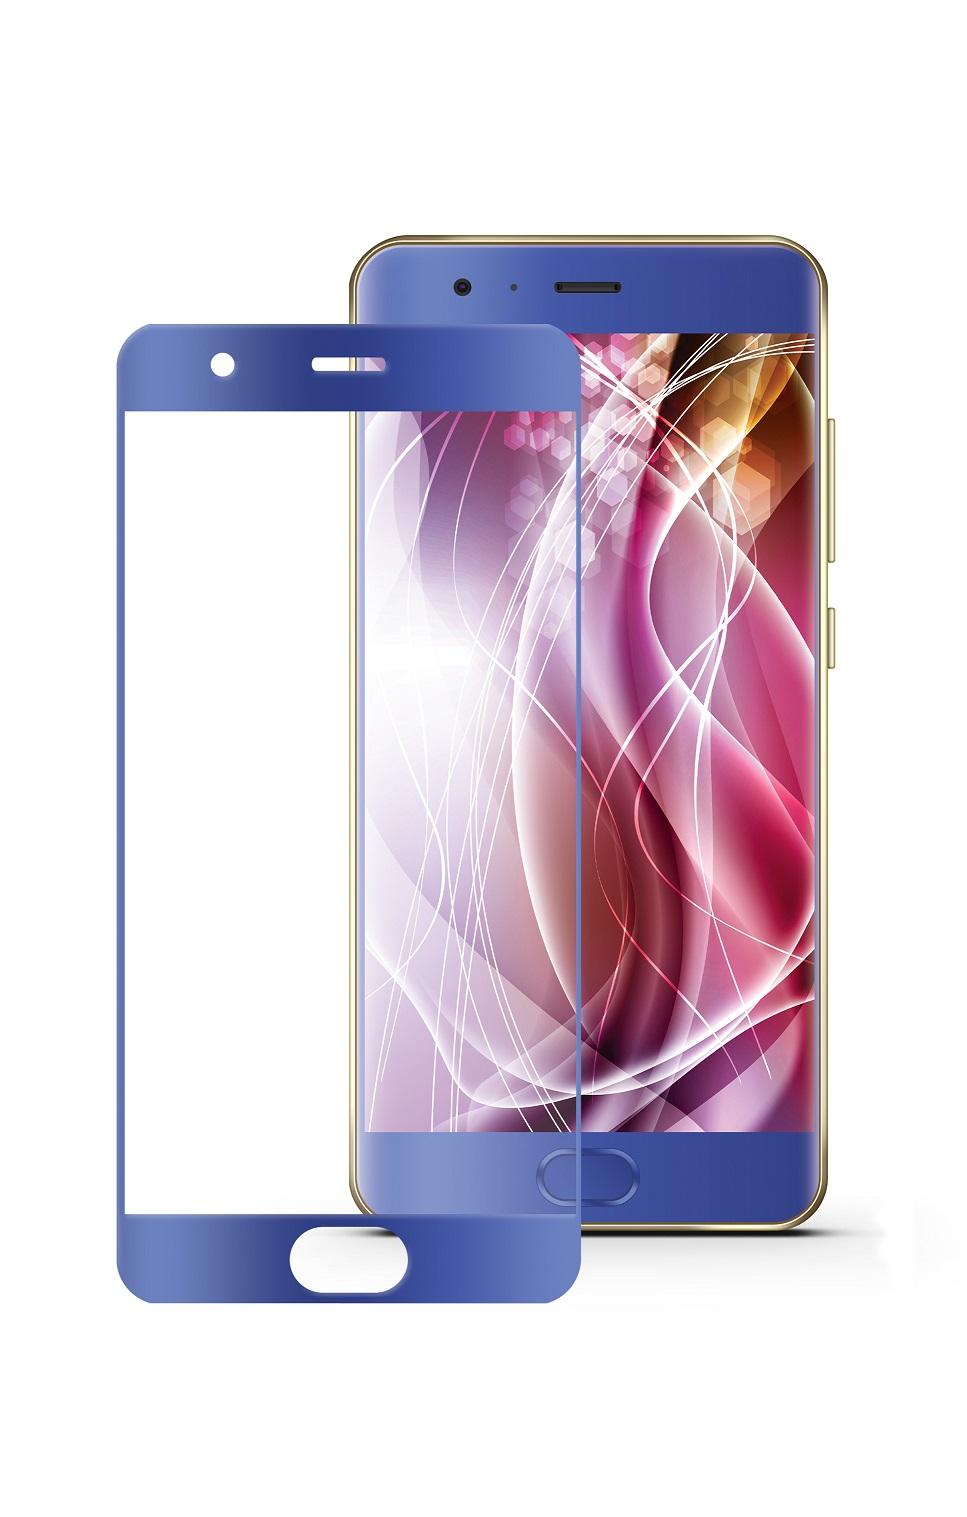 Защитное стекло Mobius для Xiaomi Mi 6 3D Full Cover (Blue) защитное стекло mobius для xiaomi mi note 3 3d full cover black